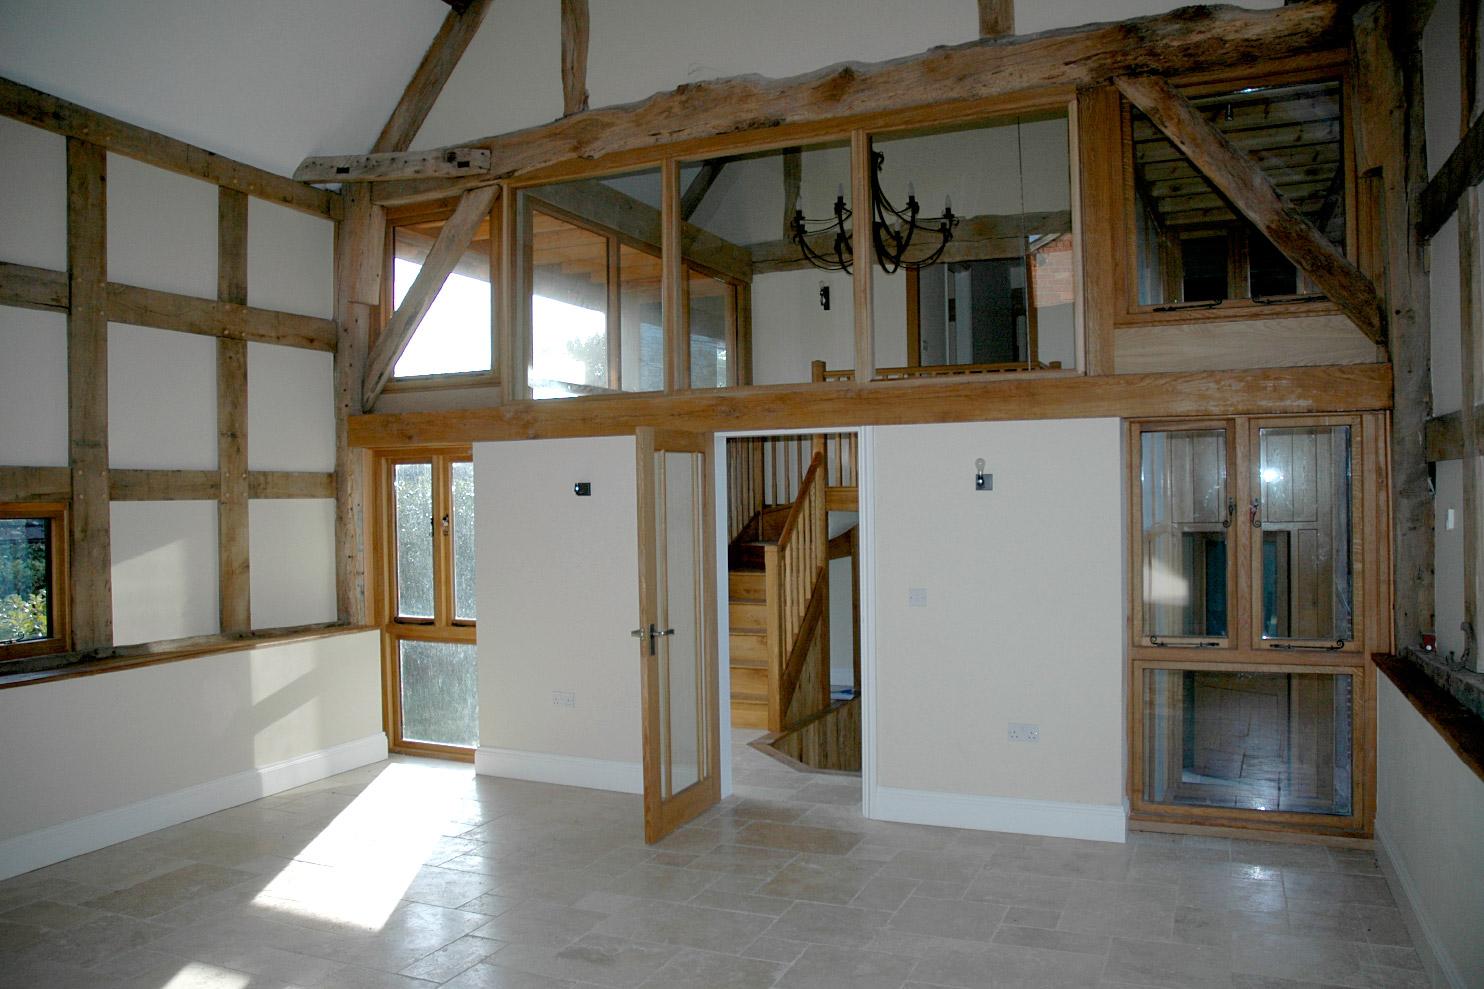 pigeon-house-barn-conversion-restored-oak-beams-herefordshire-builder.jpg